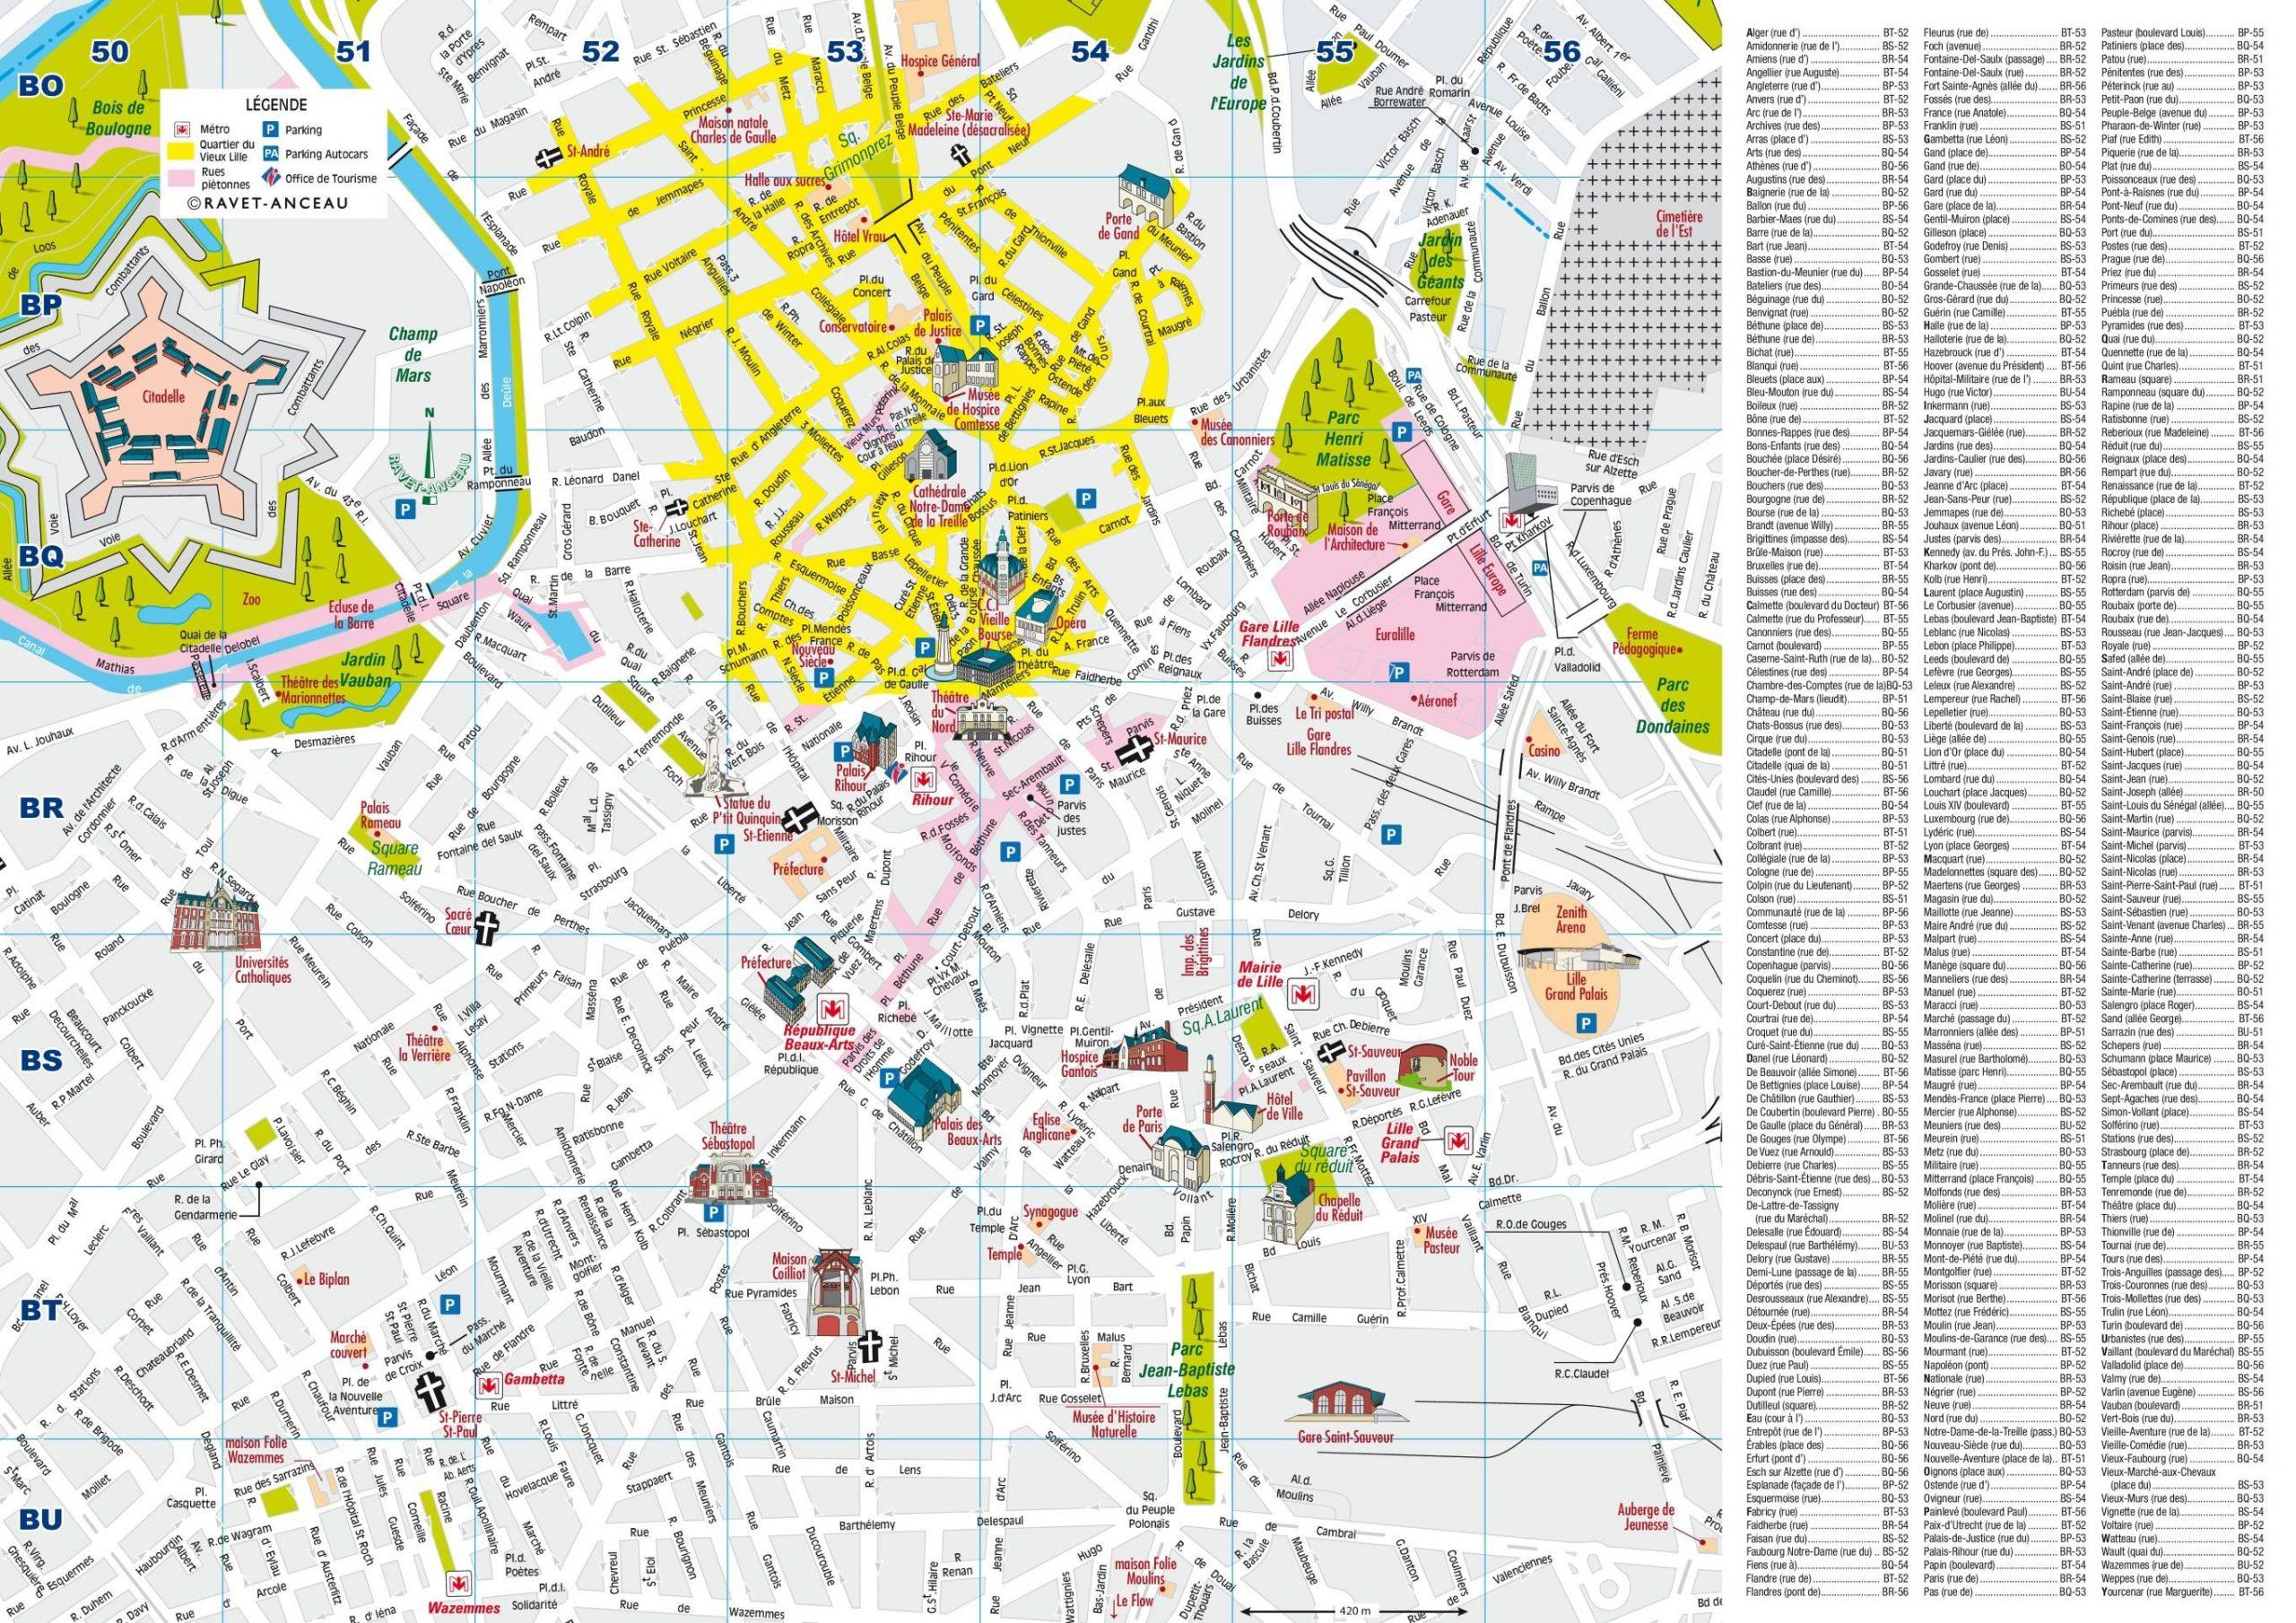 Lille Carte Touristique Imprimable Carte Imprimable De Lille avec Carte De France Imprimable